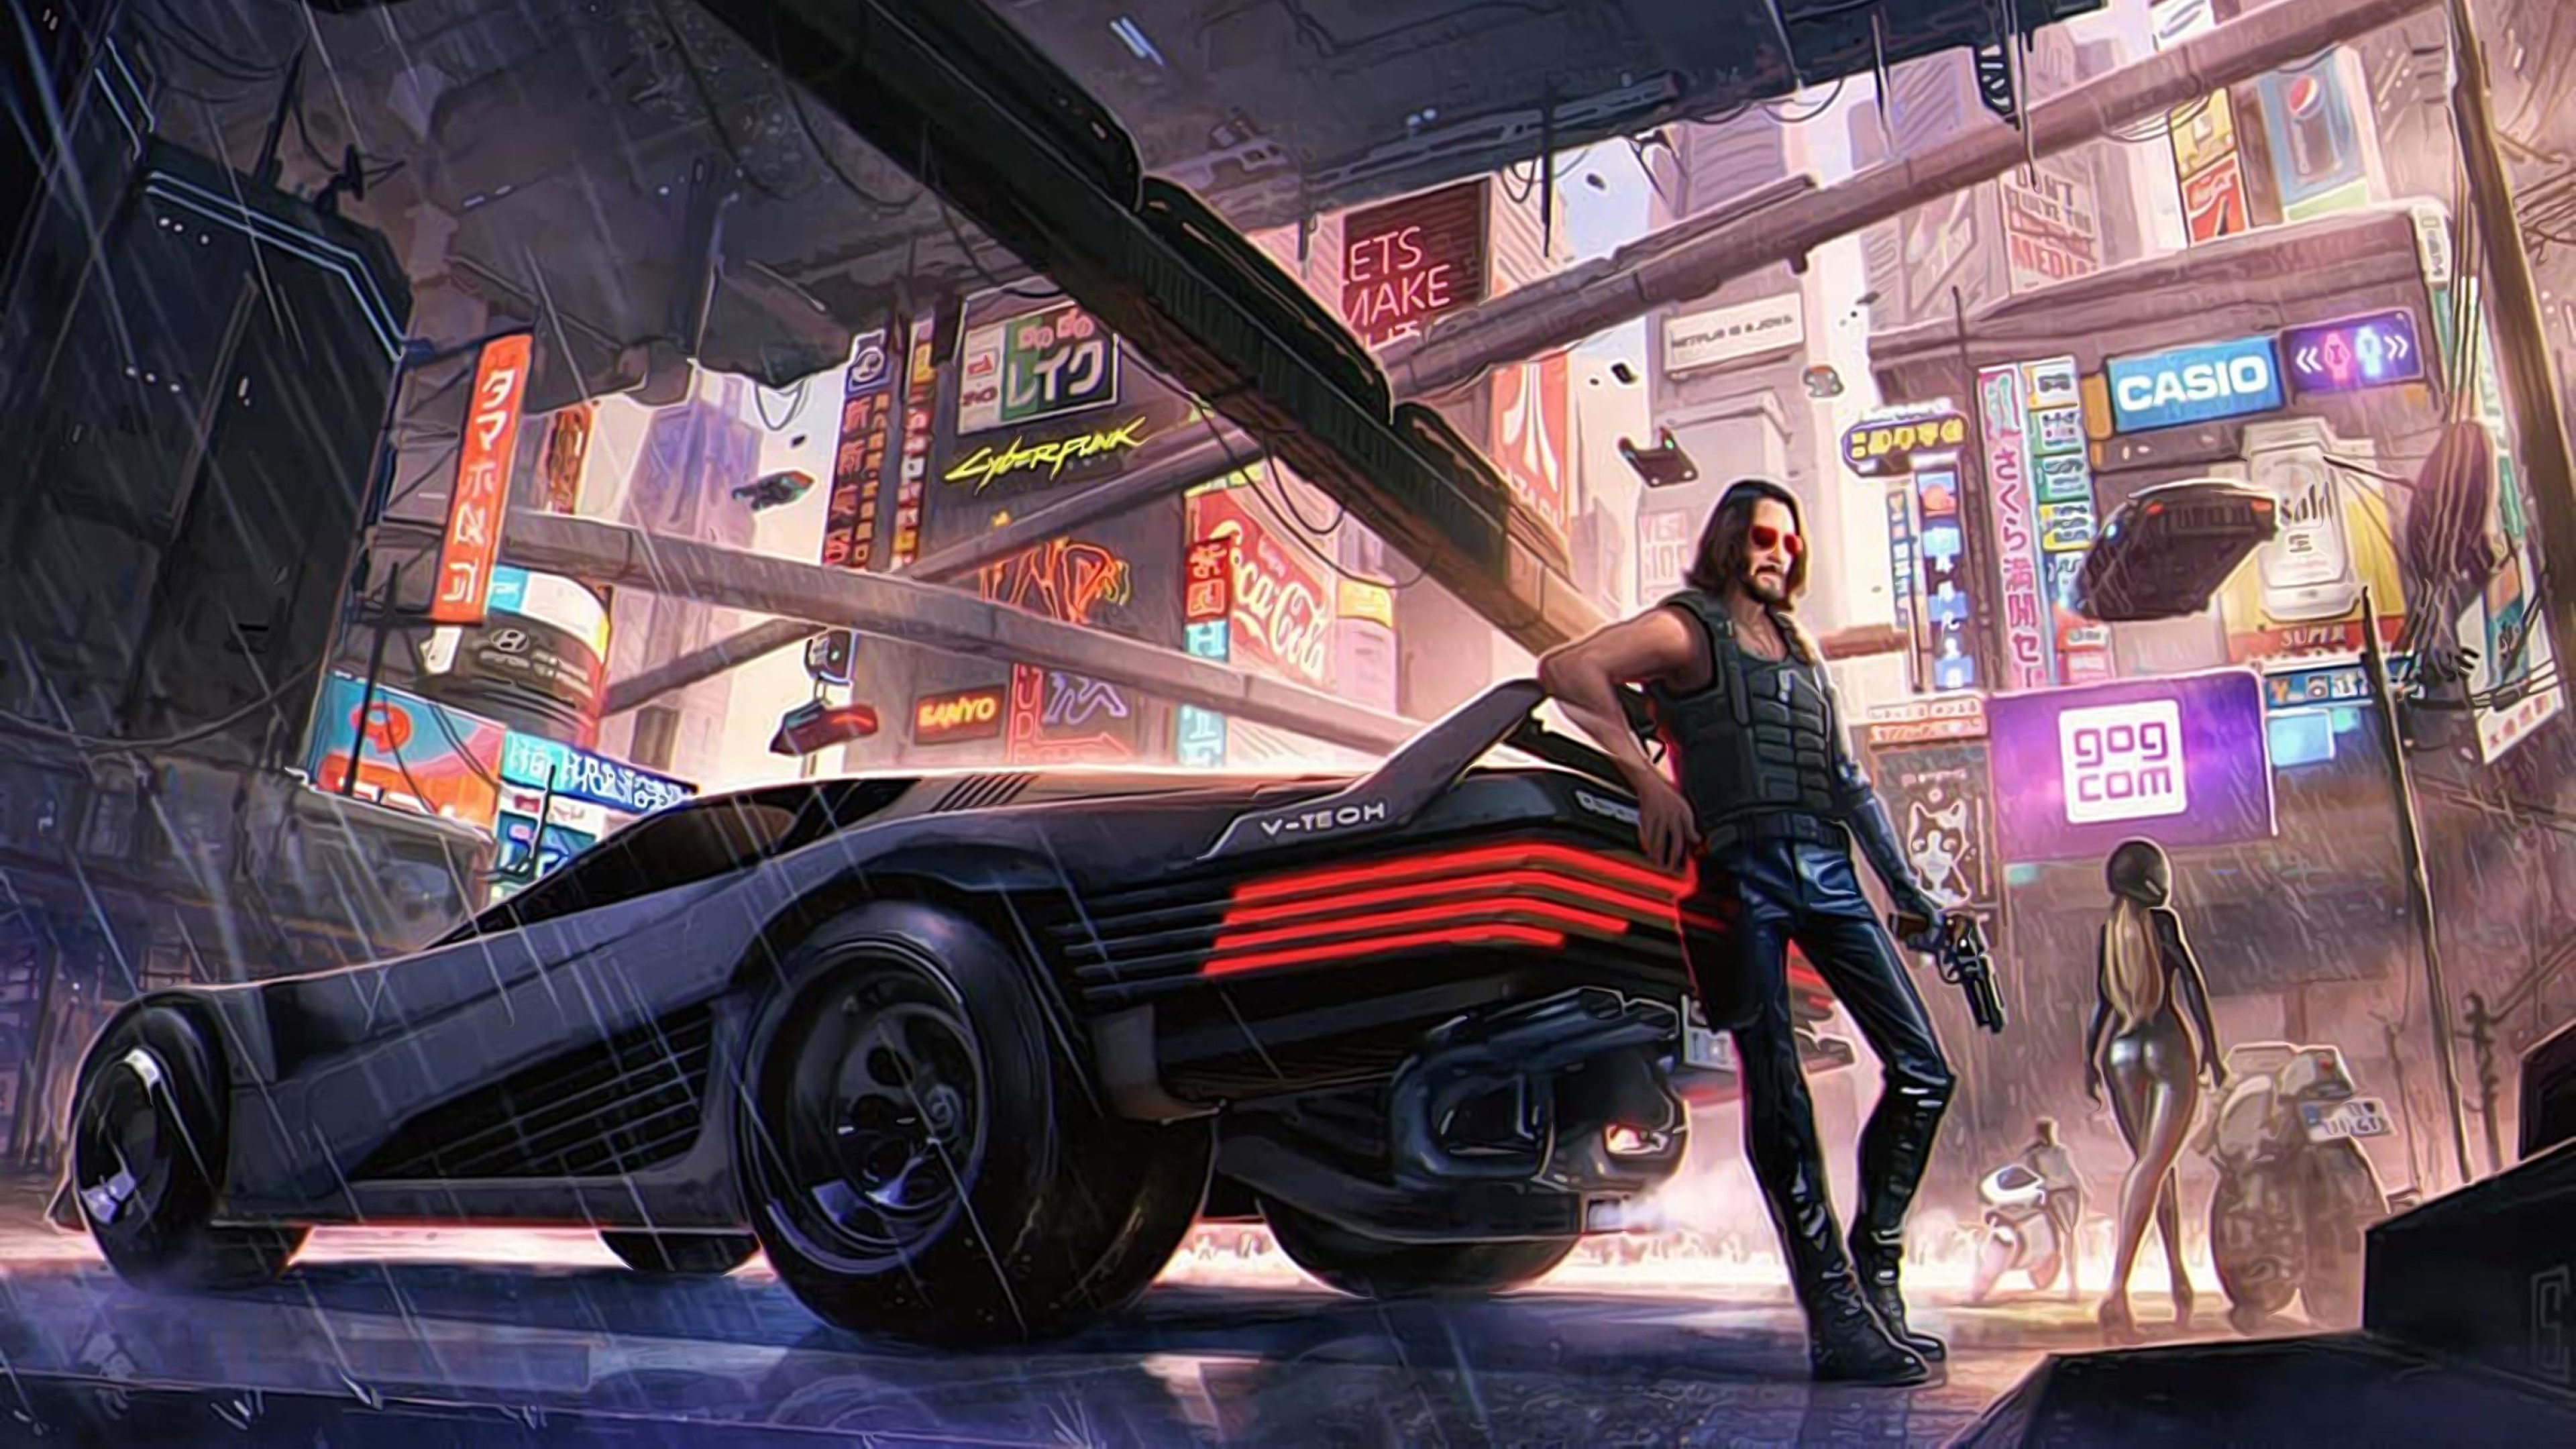 3840x2160 Keanu Reeves Cyberpunk 2077 Art 4K Wallpaper, HD ...